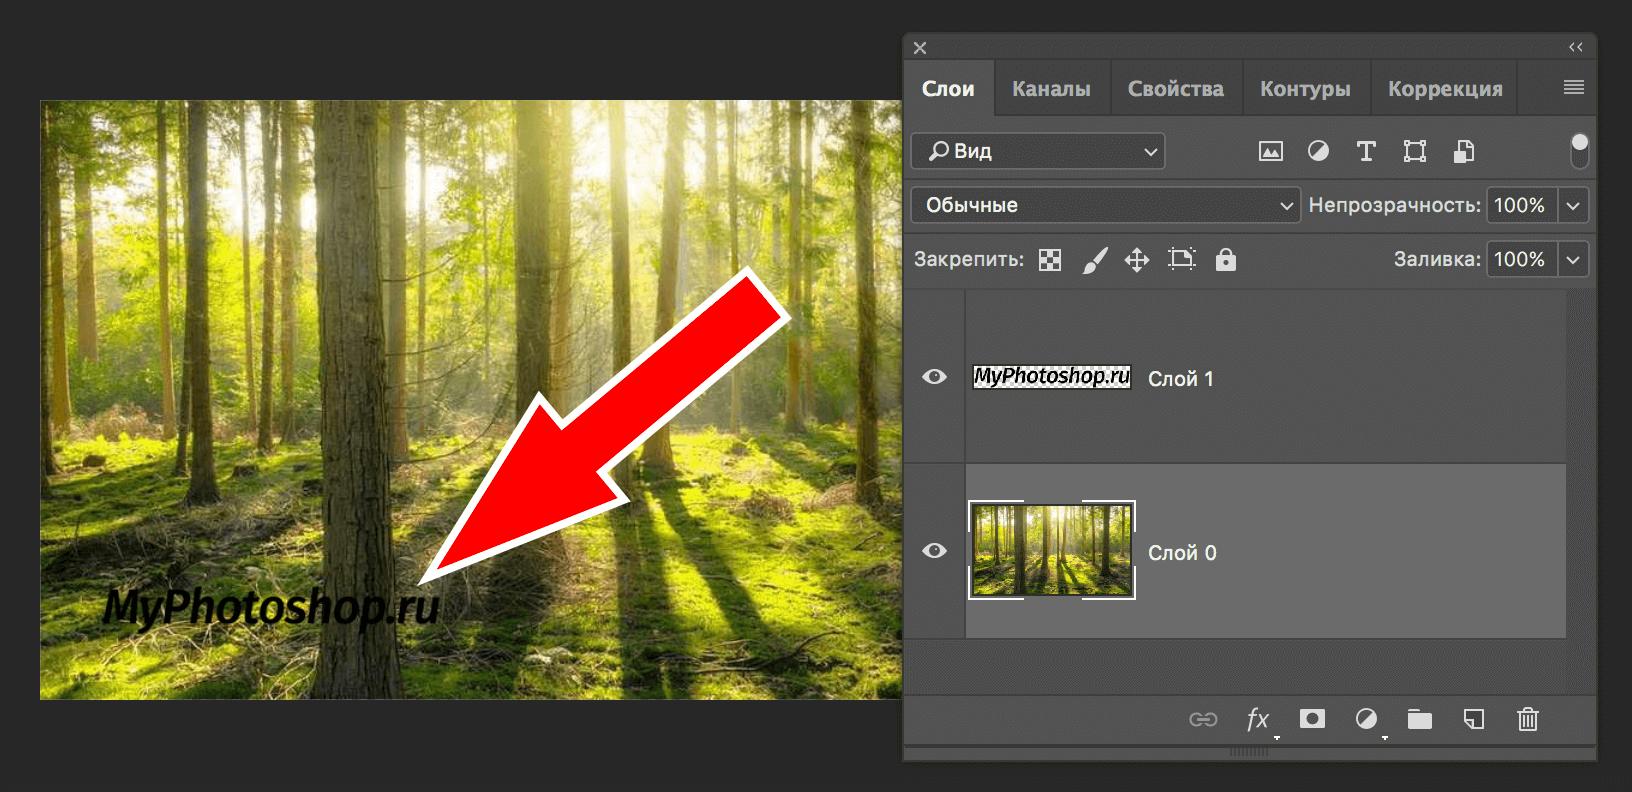 логотип и фото леса